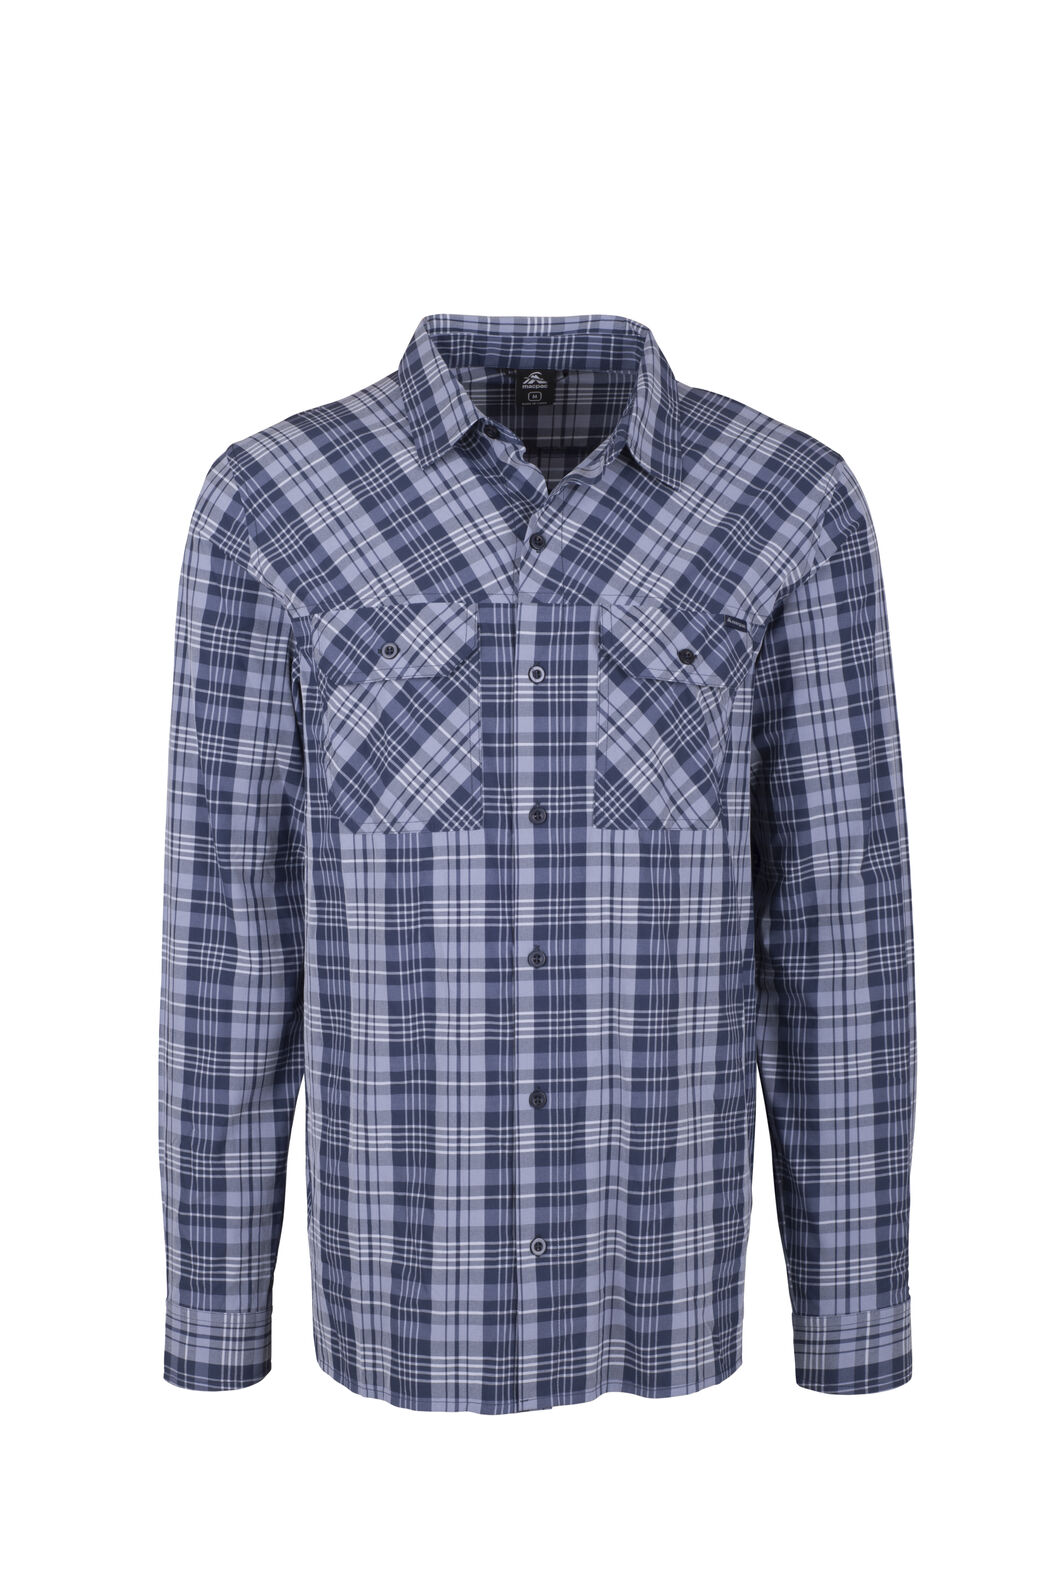 Macpac Eclipse Long Sleeve Shirt - Men's, Black Iris, hi-res